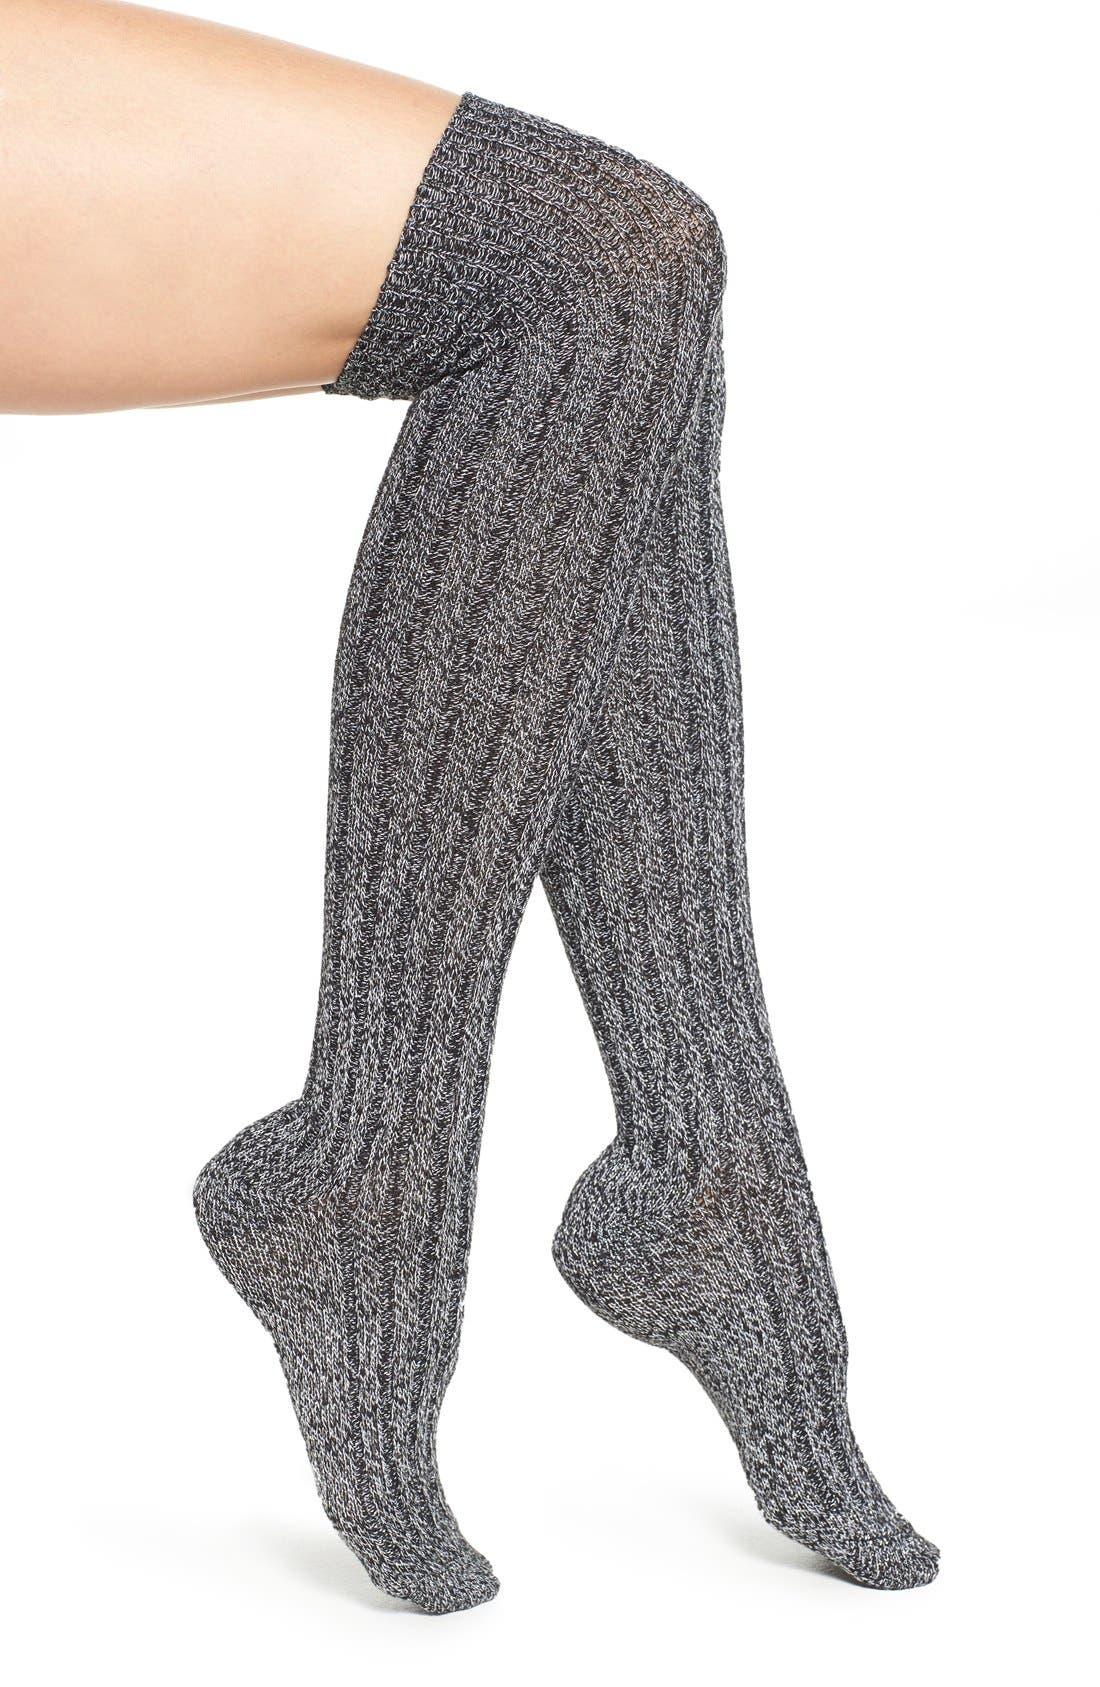 Main Image - Nordstrom Sparkle Knit Over the Knee Socks